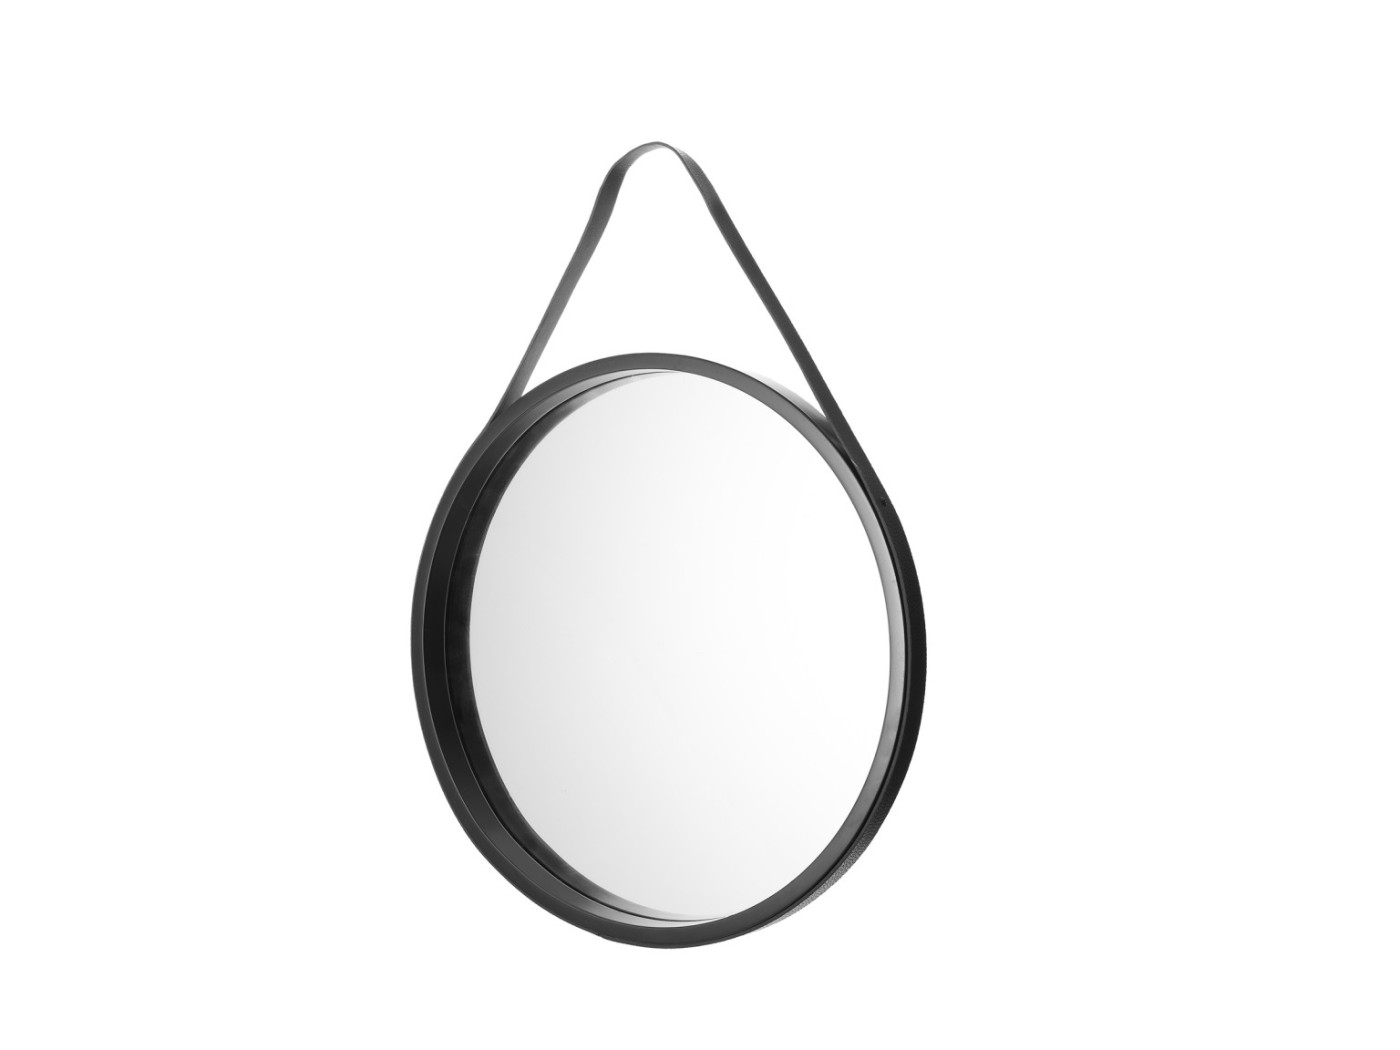 astrid-mirror-f0-1536x1152.jpg